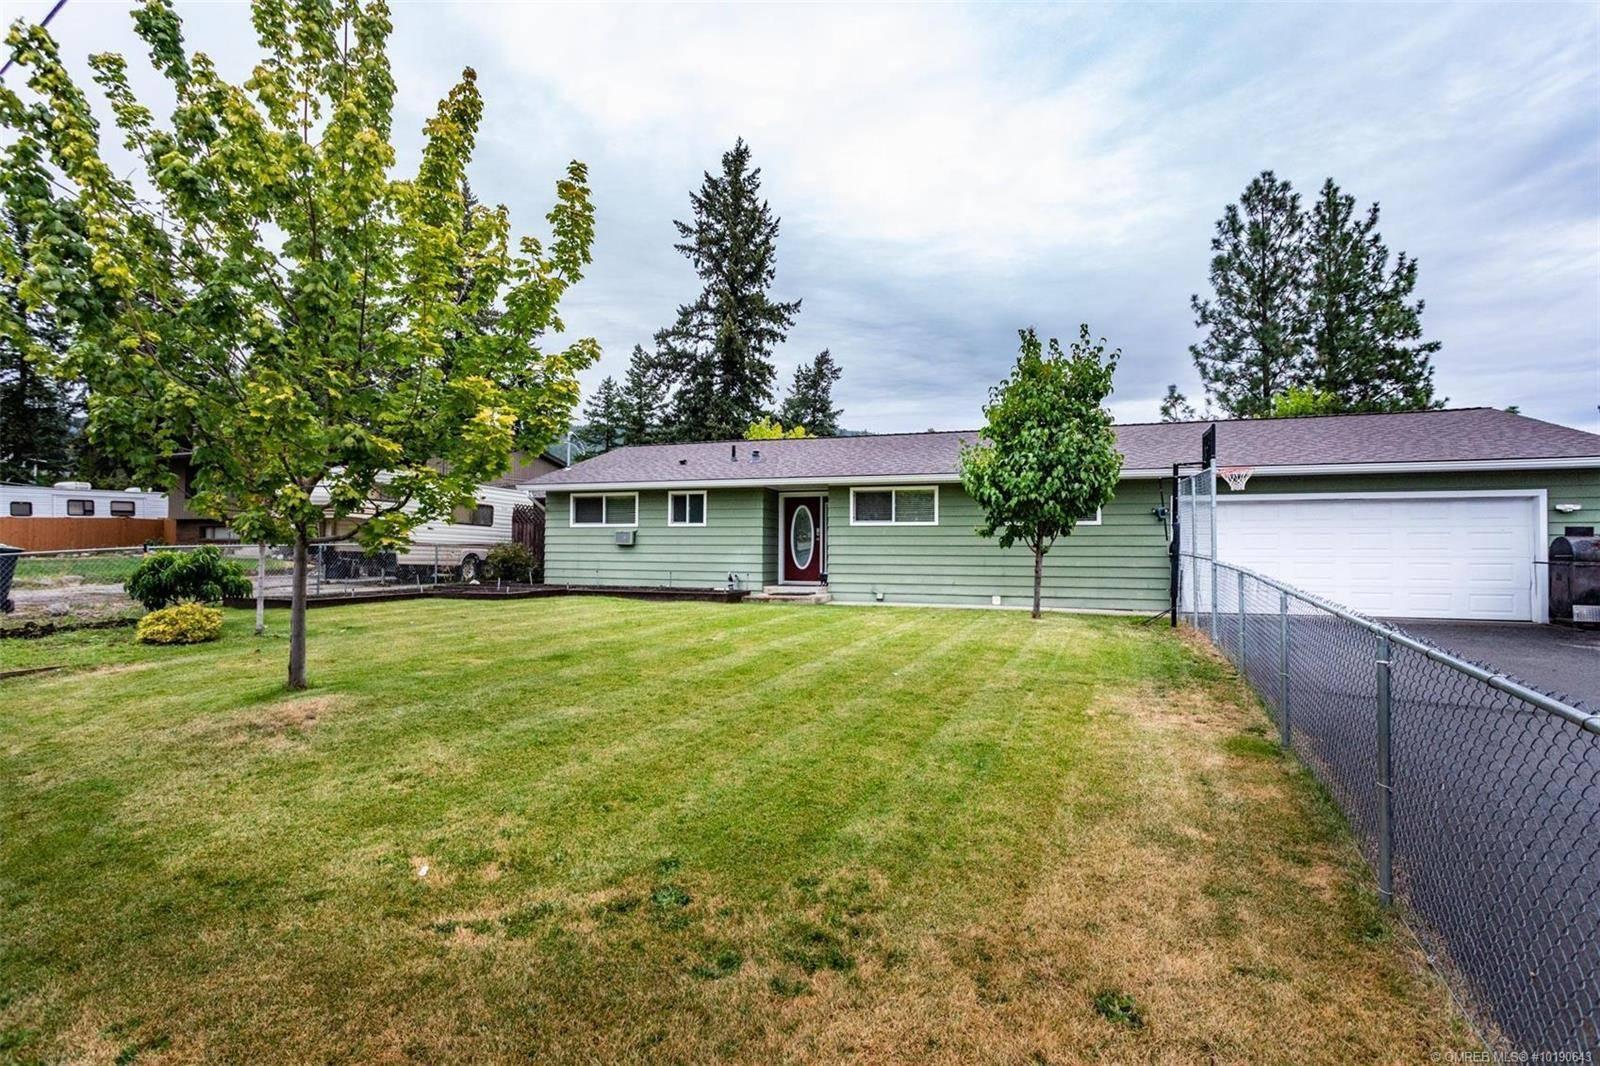 House for sale at 3247 Mcgregor Rd West Kelowna British Columbia - MLS: 10190643